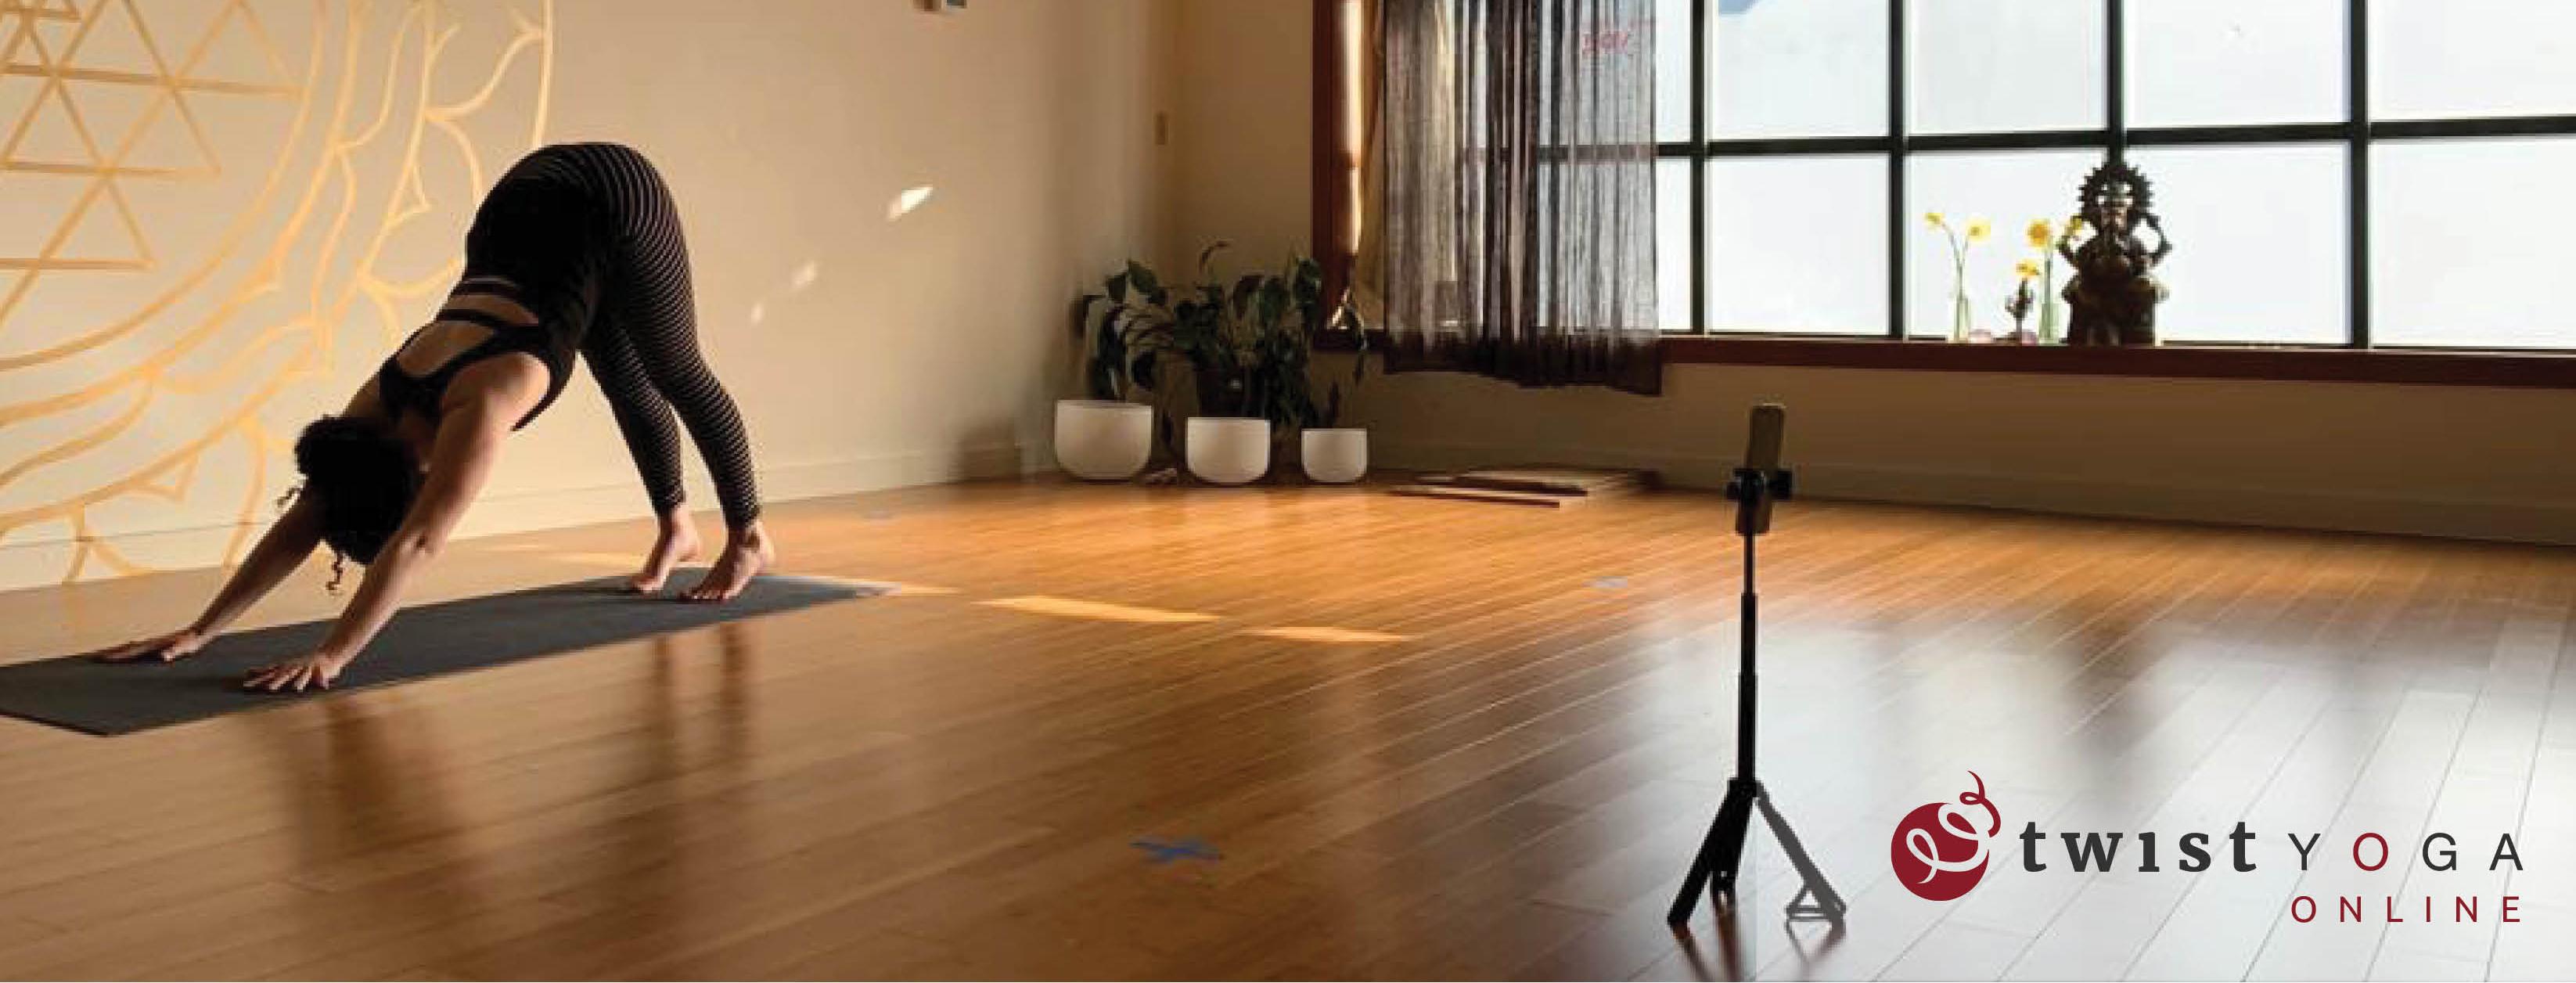 twist-yoga-online